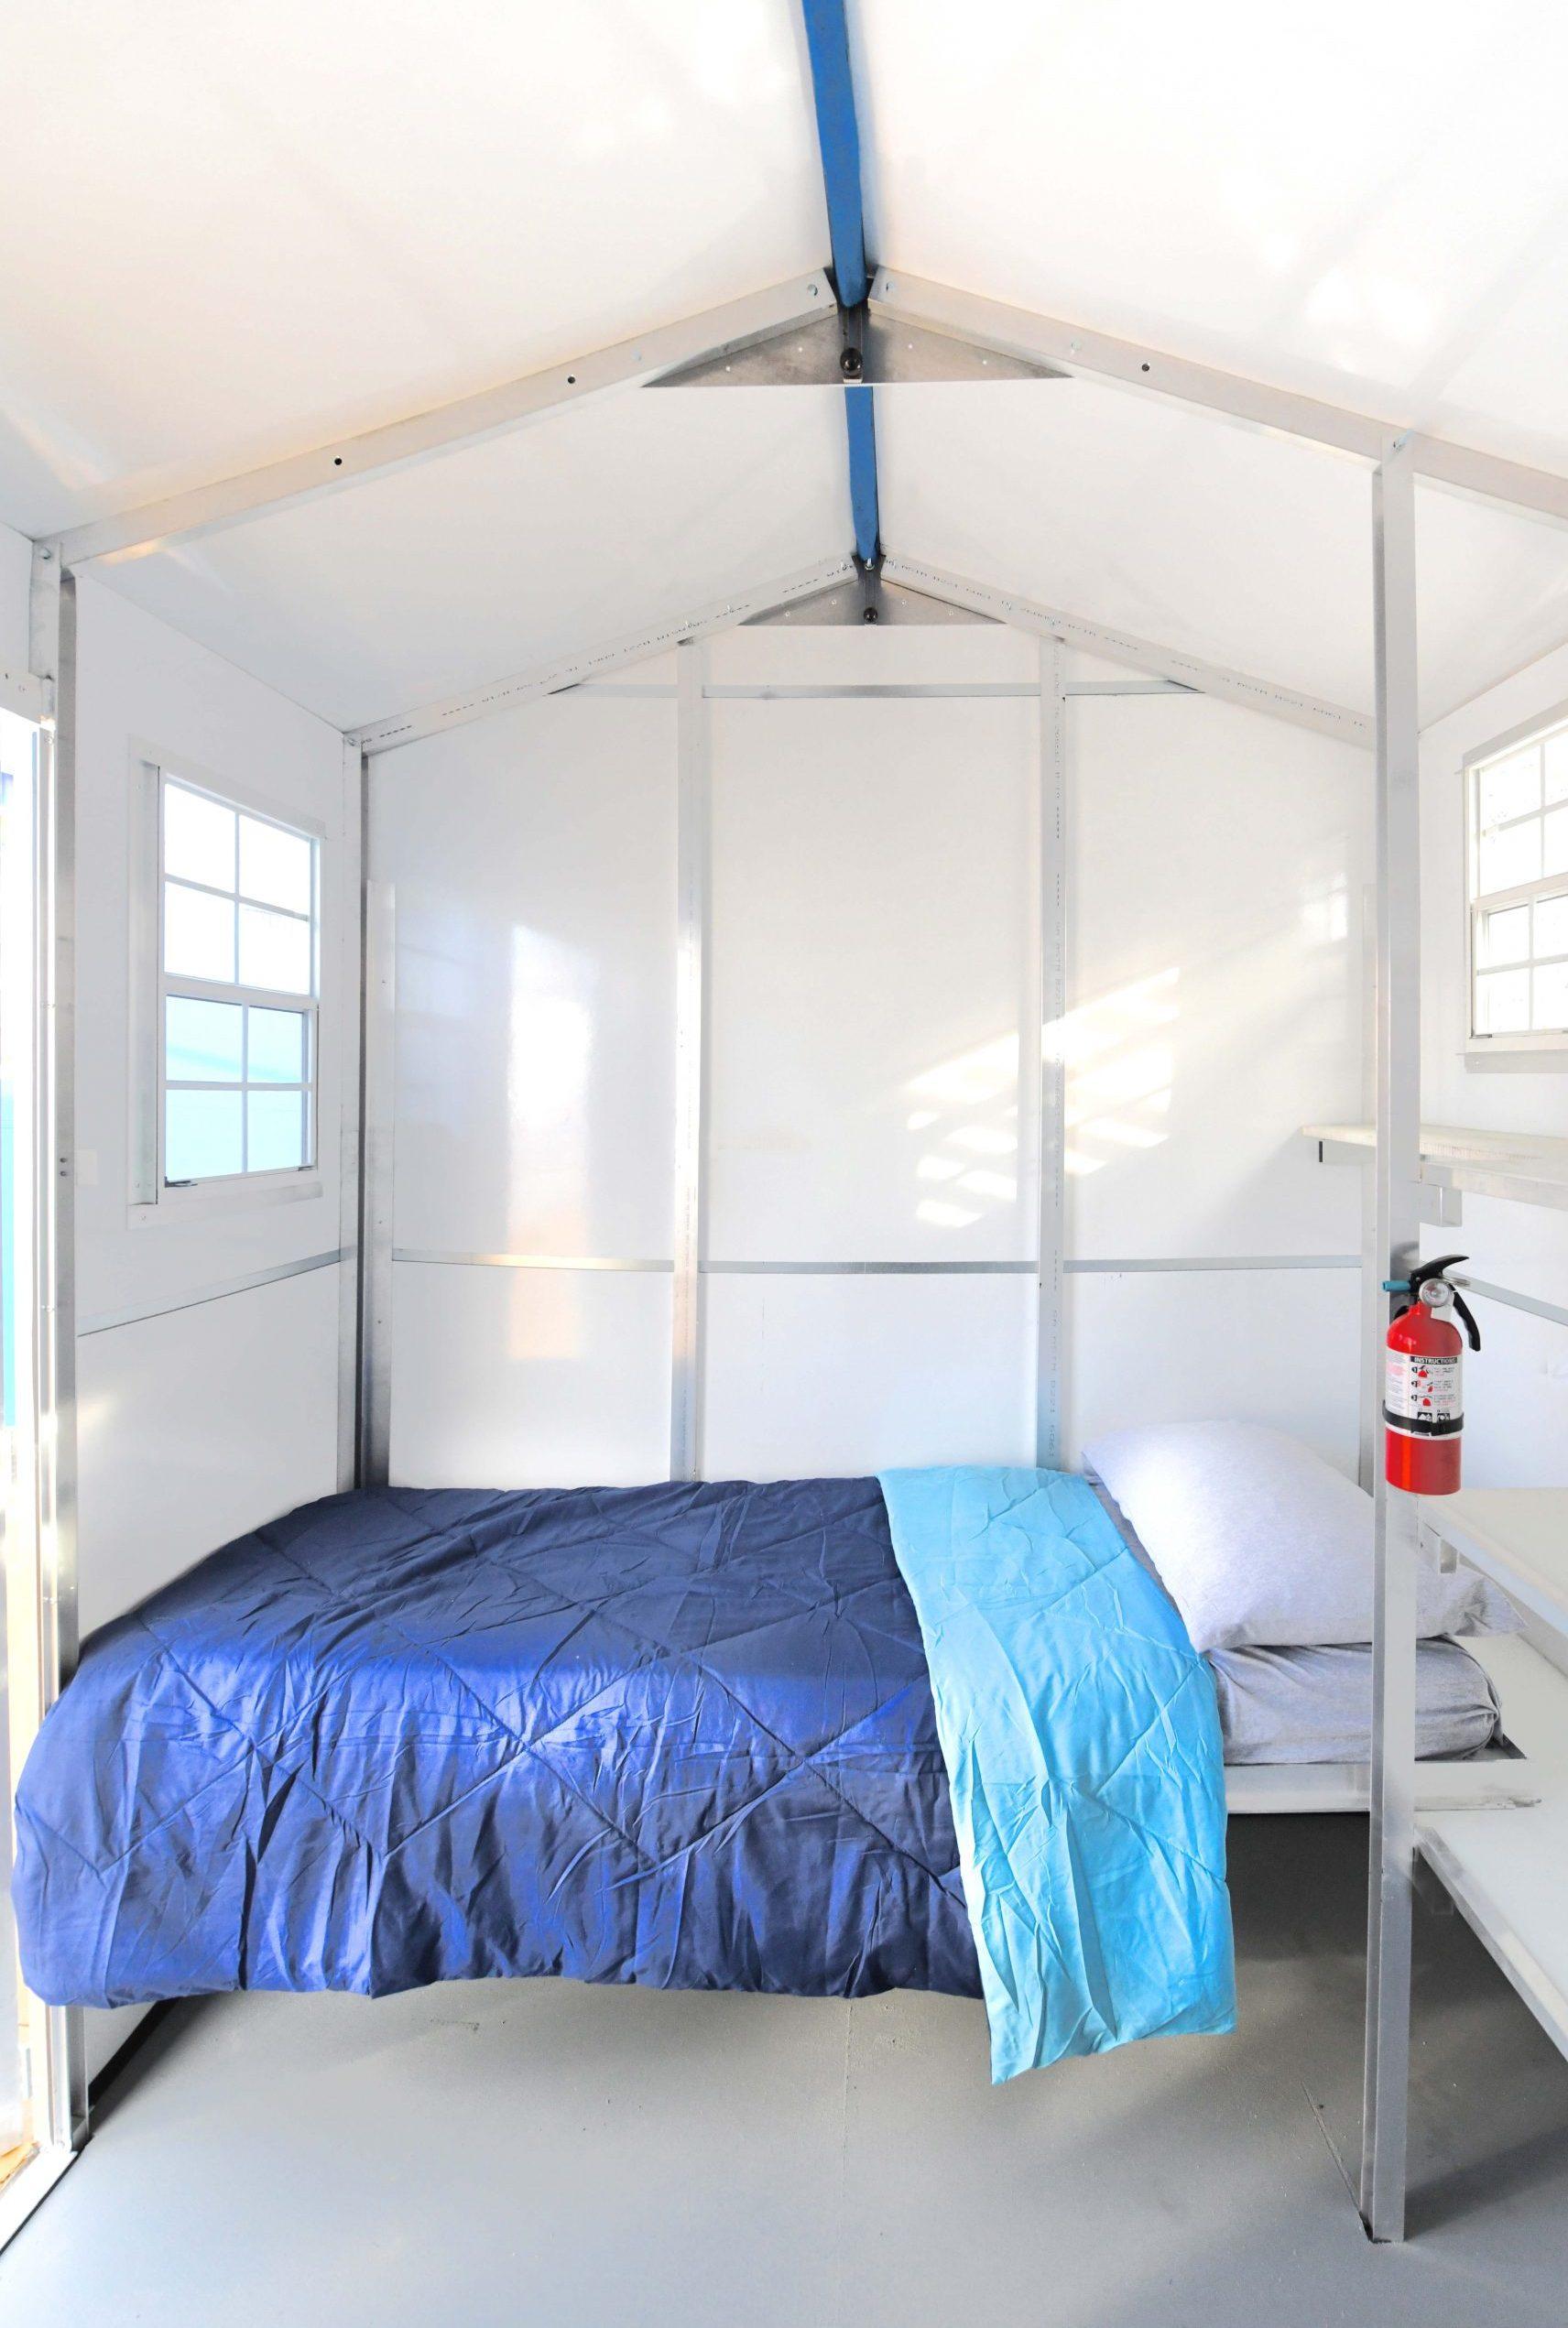 Un interior sencillo, pero práctico